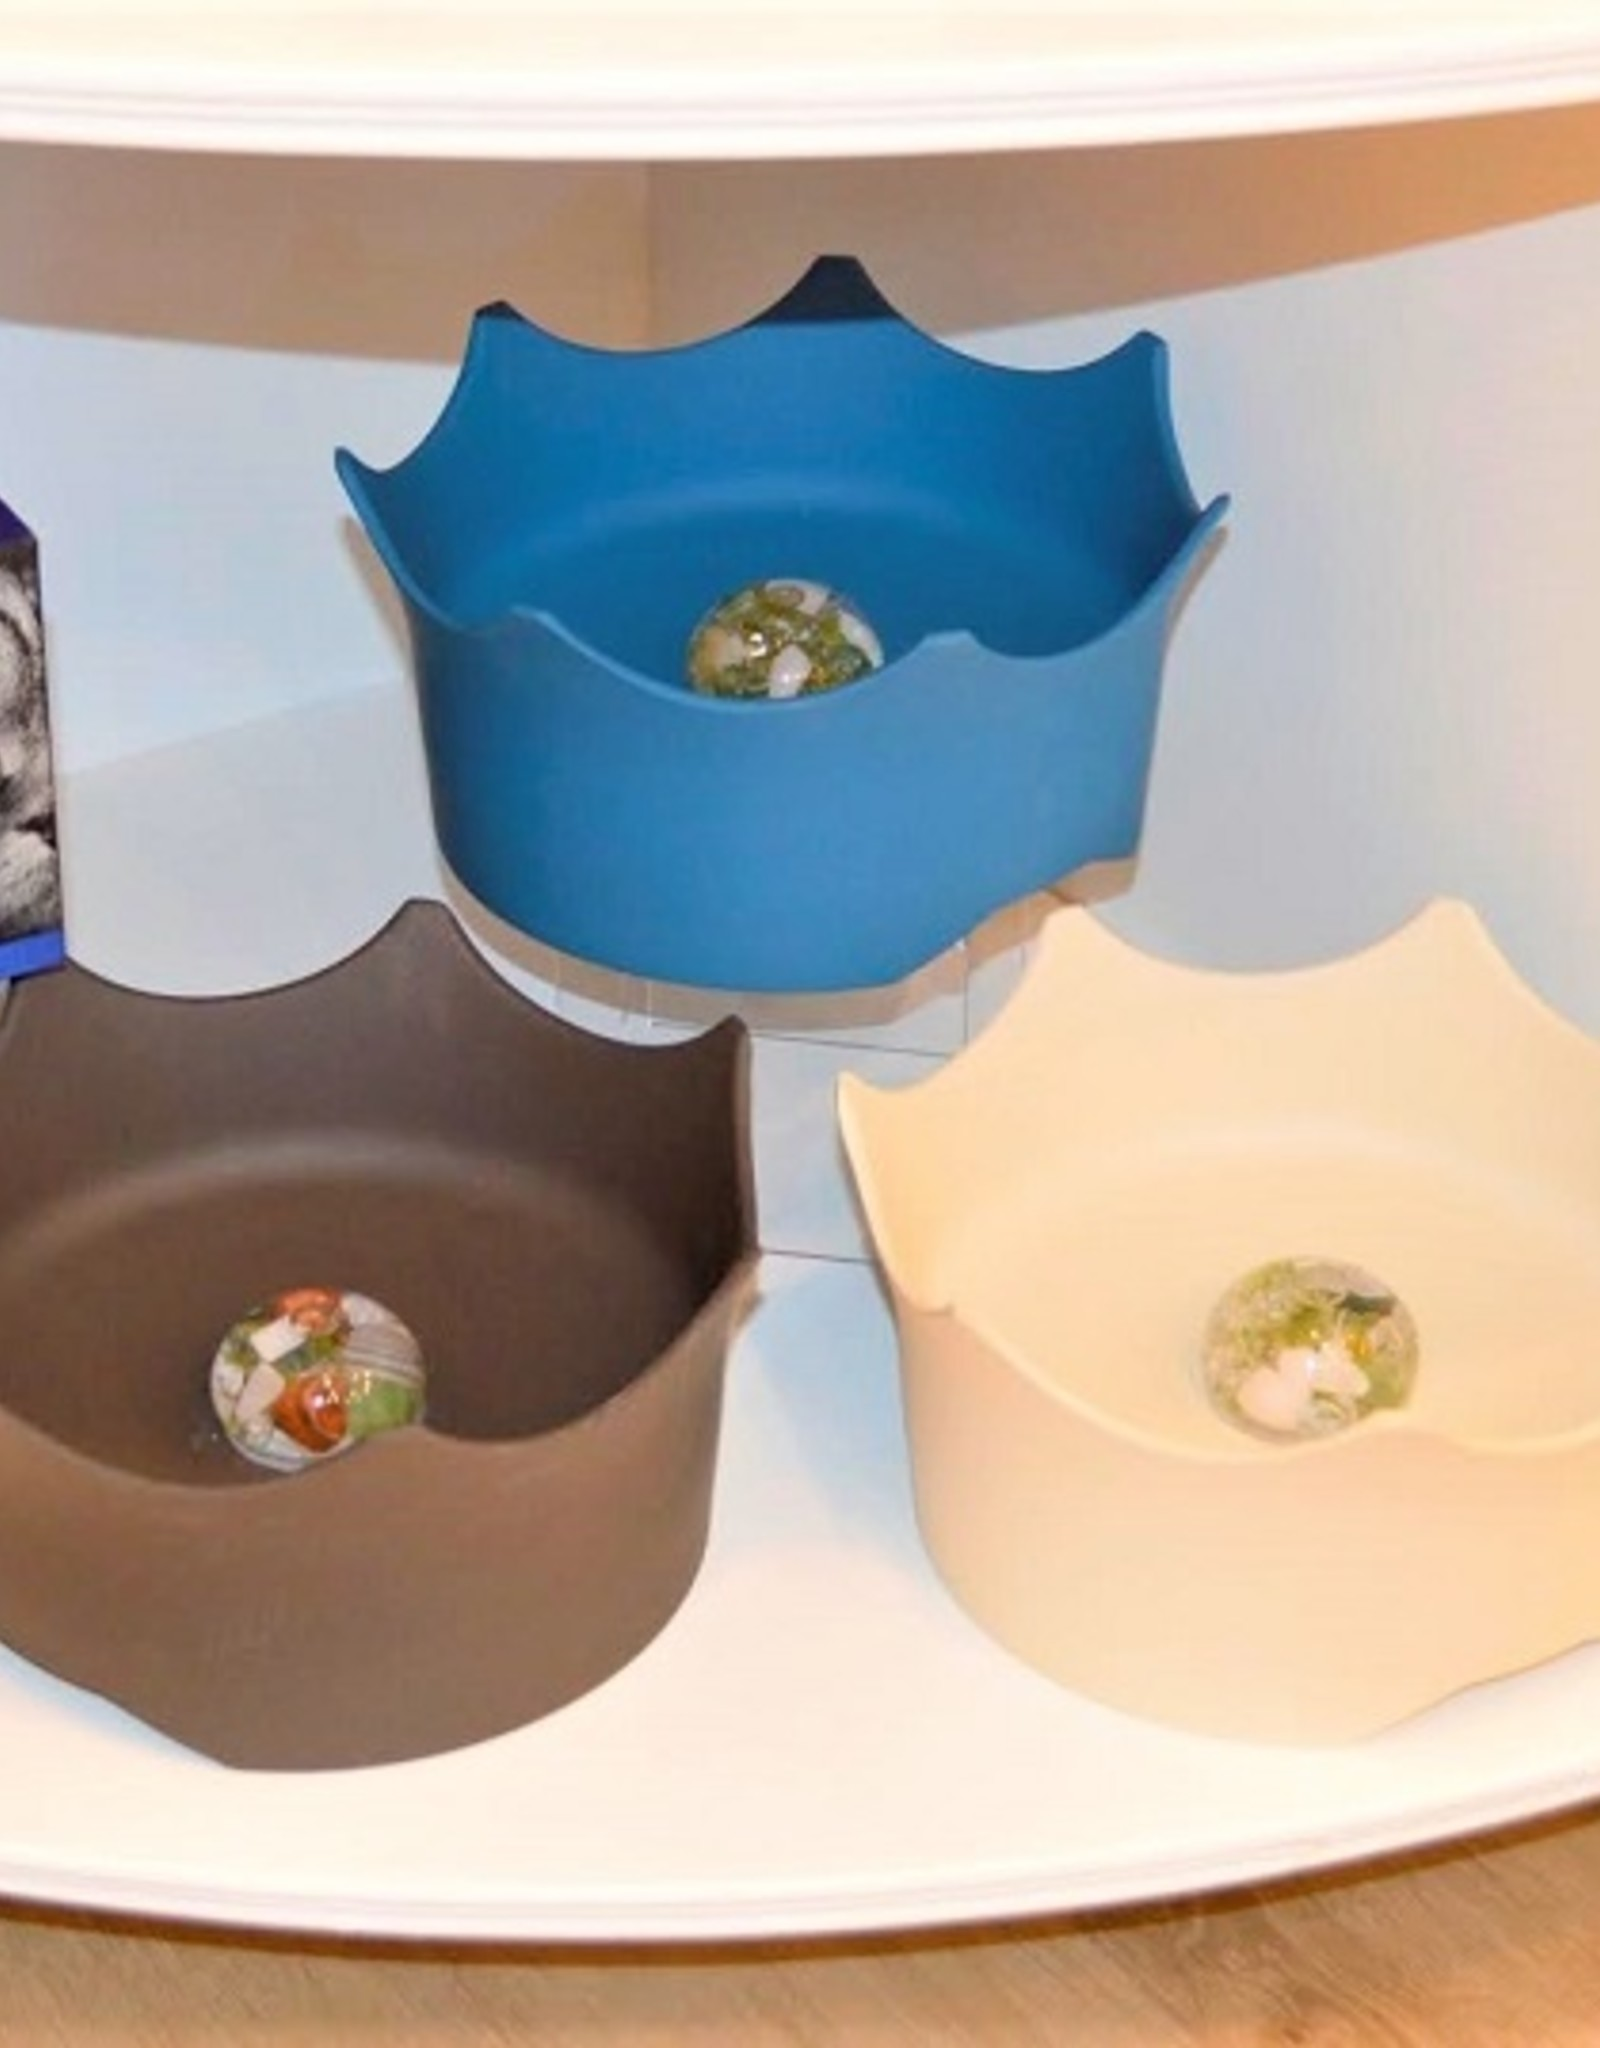 Gem Water Gem-Water CrownJuwel Pet Bowl by VitaJuwel in Slate Gray